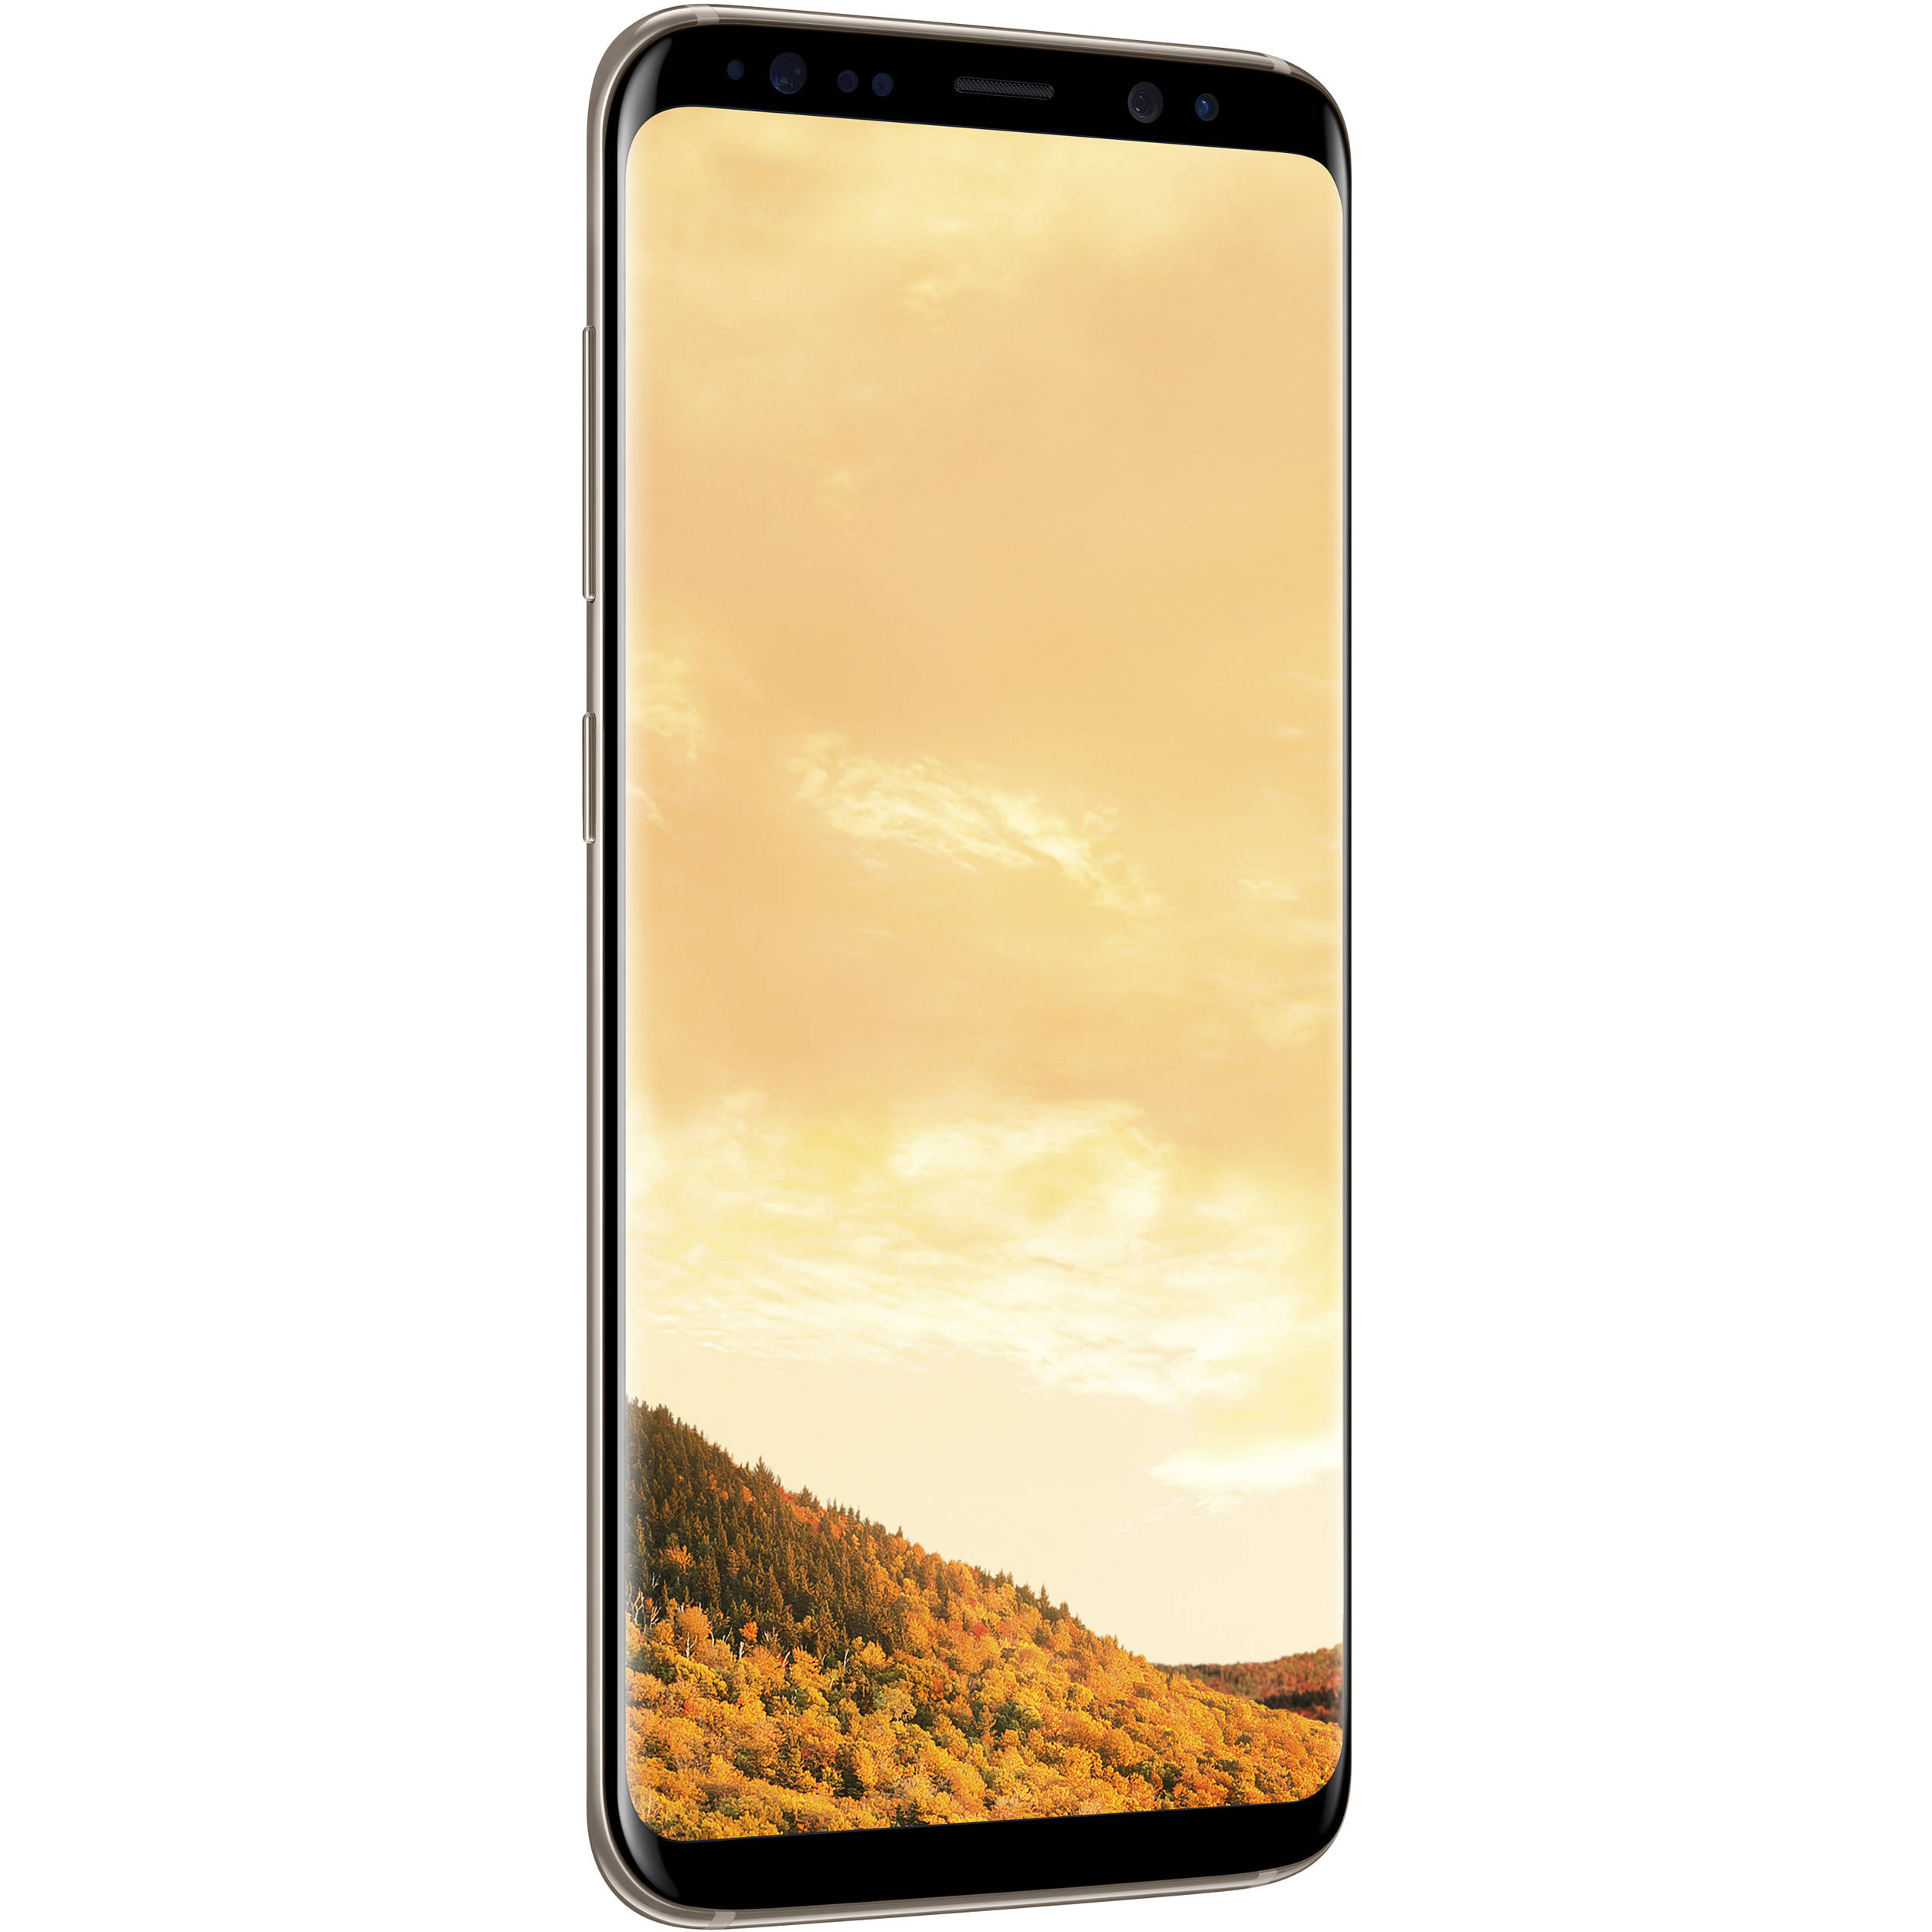 Samsung Galaxy S8 Sm G950f 64gb Smartphone G950 Gld Bh Xiaomi Redmi Note 4 Ram 4gb Distributor 64 Lte Dual Sim Unlocked Maple Gold